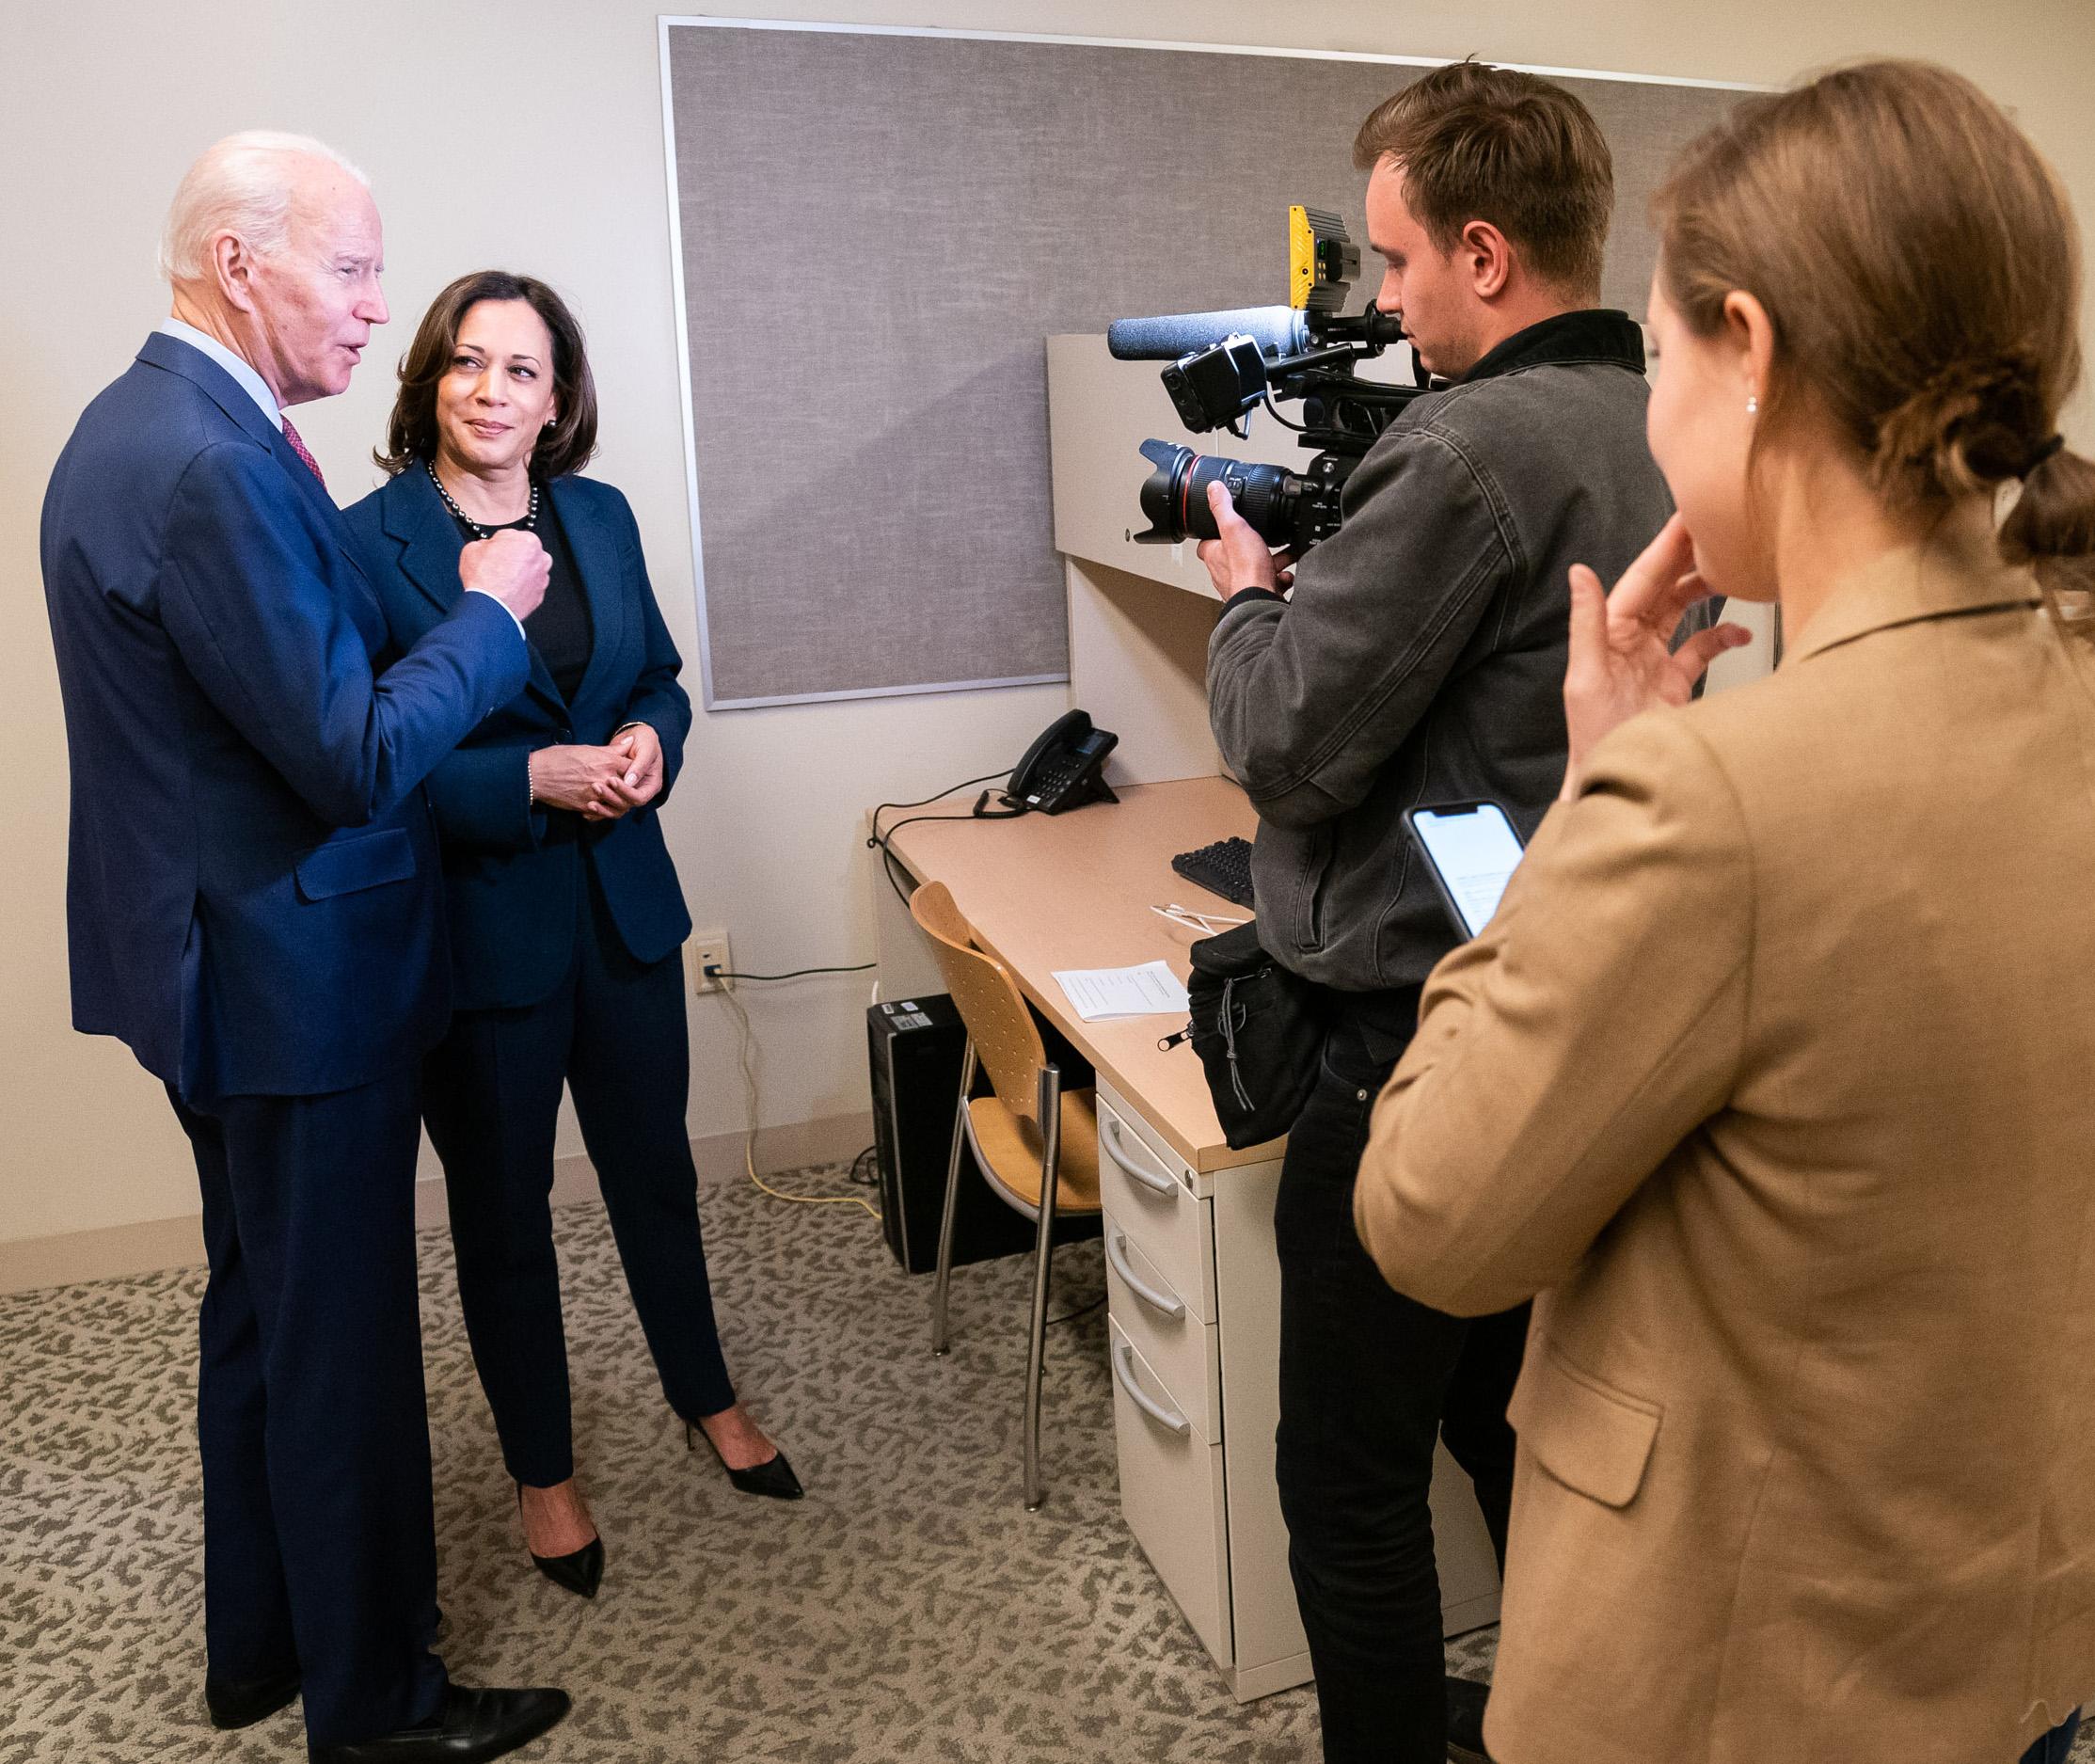 Drew Heskett videotapes Joe Biden and Kamala Harris